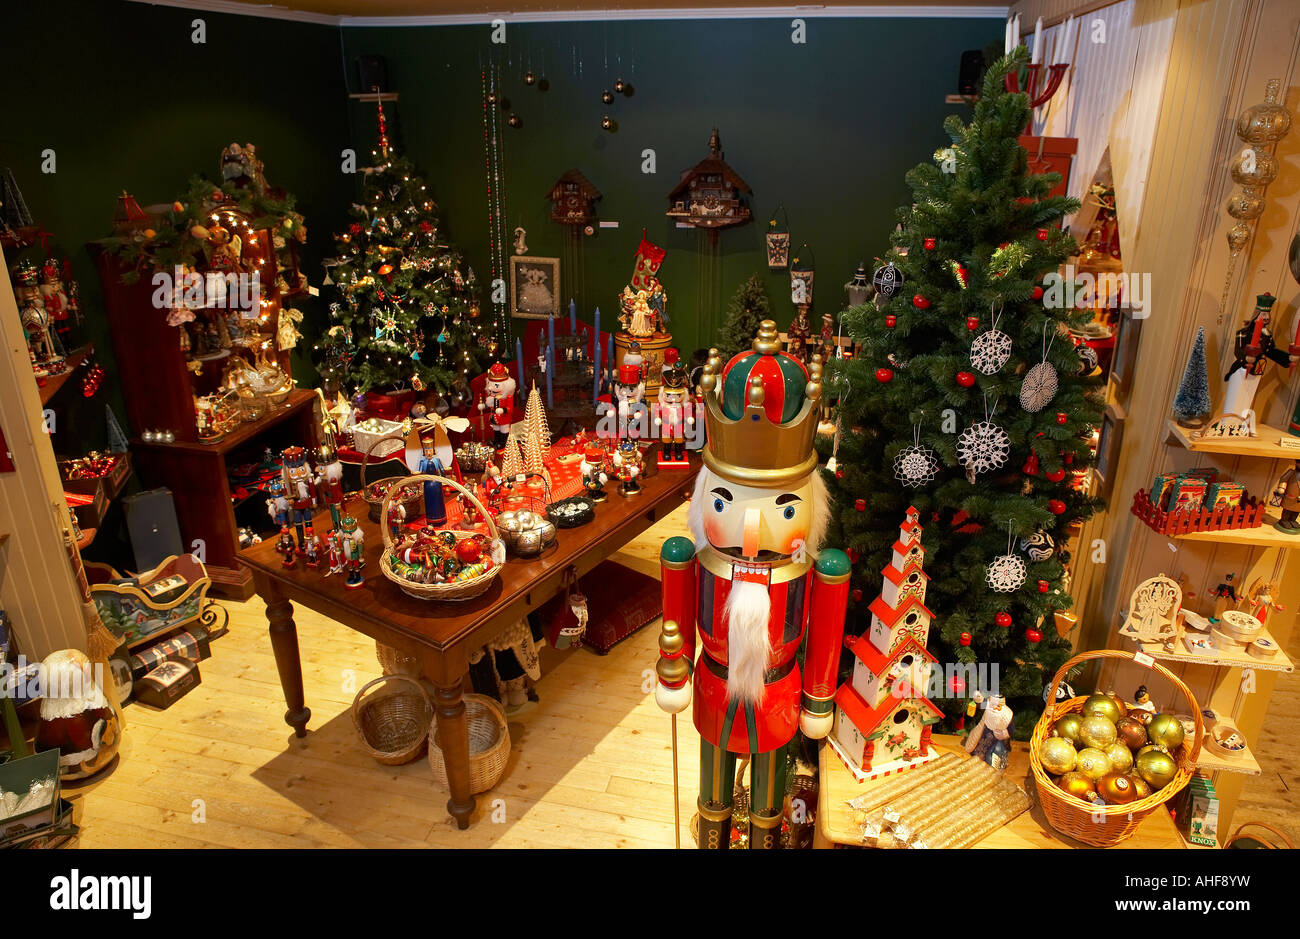 Christmas Decorations Sale | eBay